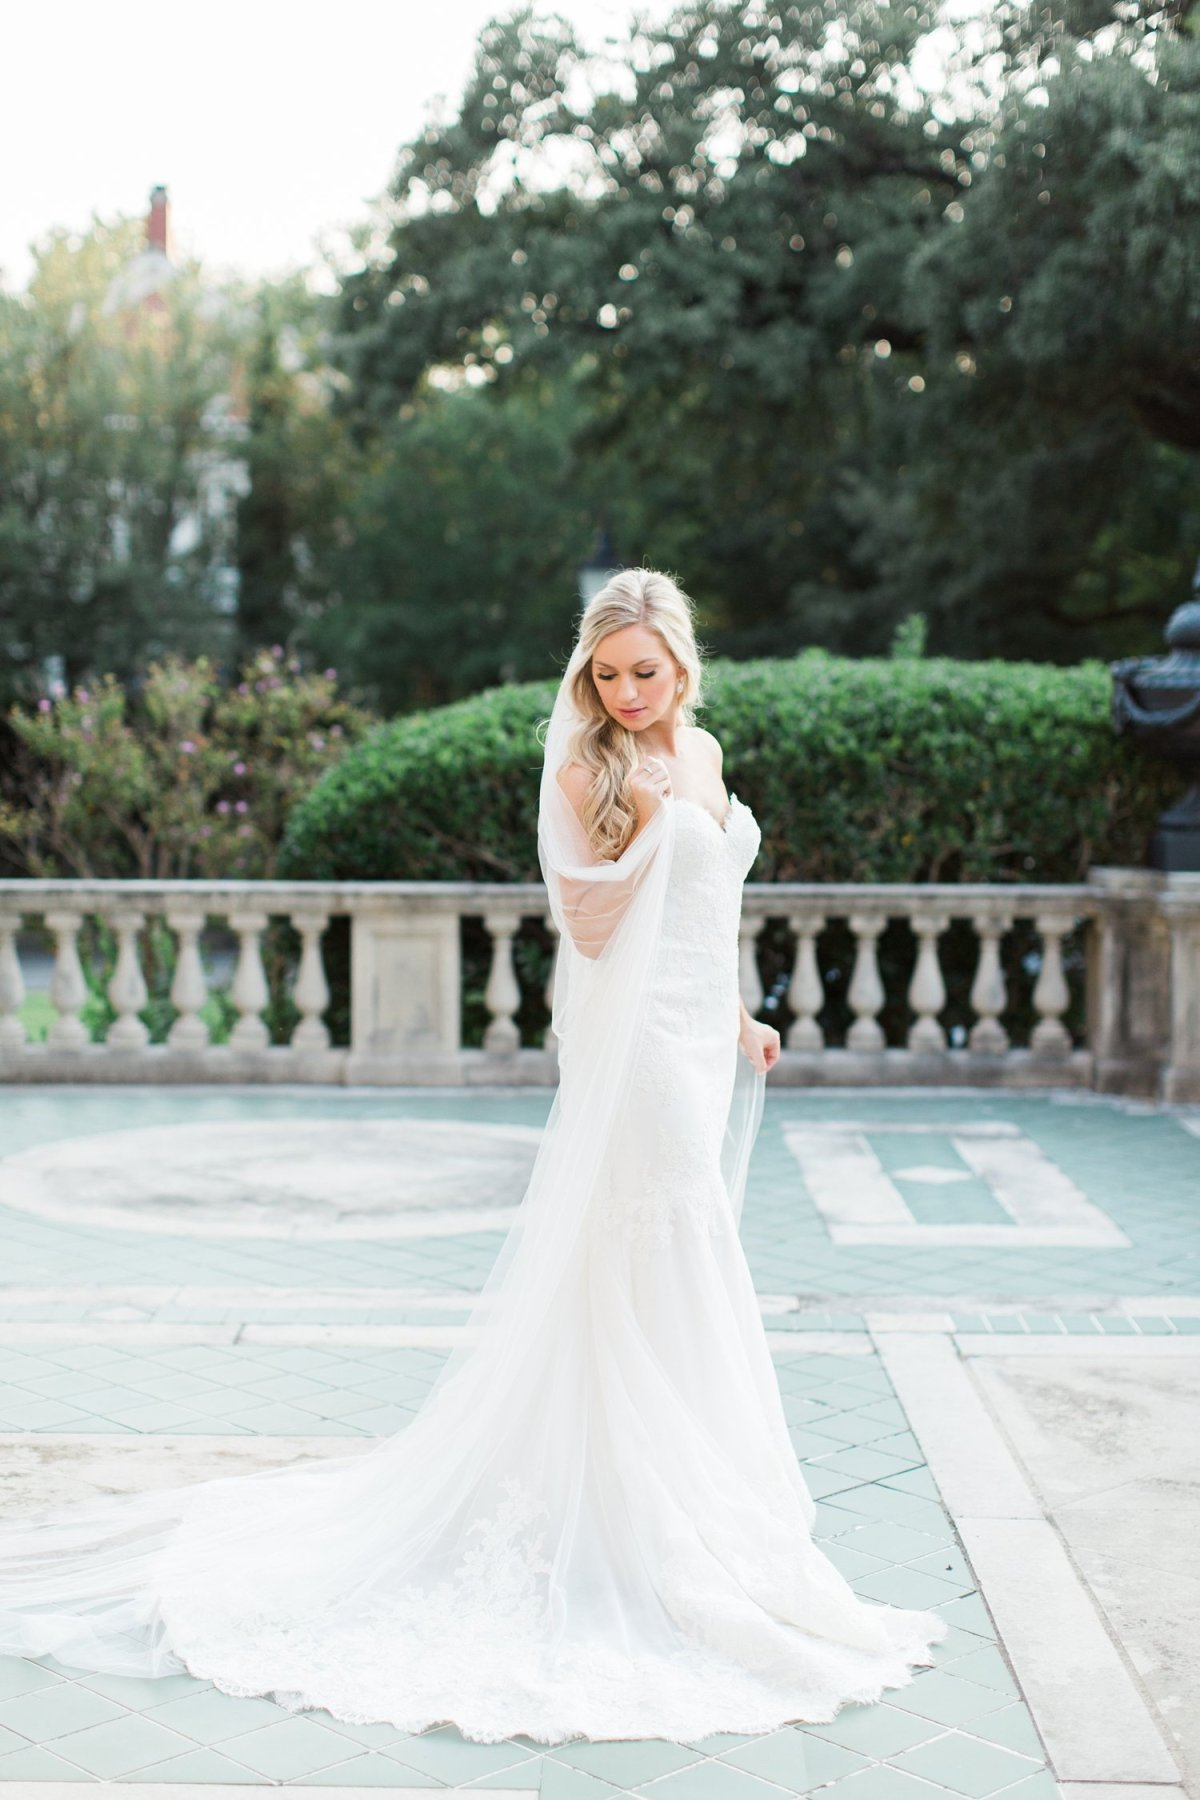 dallas-bridal-wedding-portrait-photographer-aldredge-house-emily-15.jpg